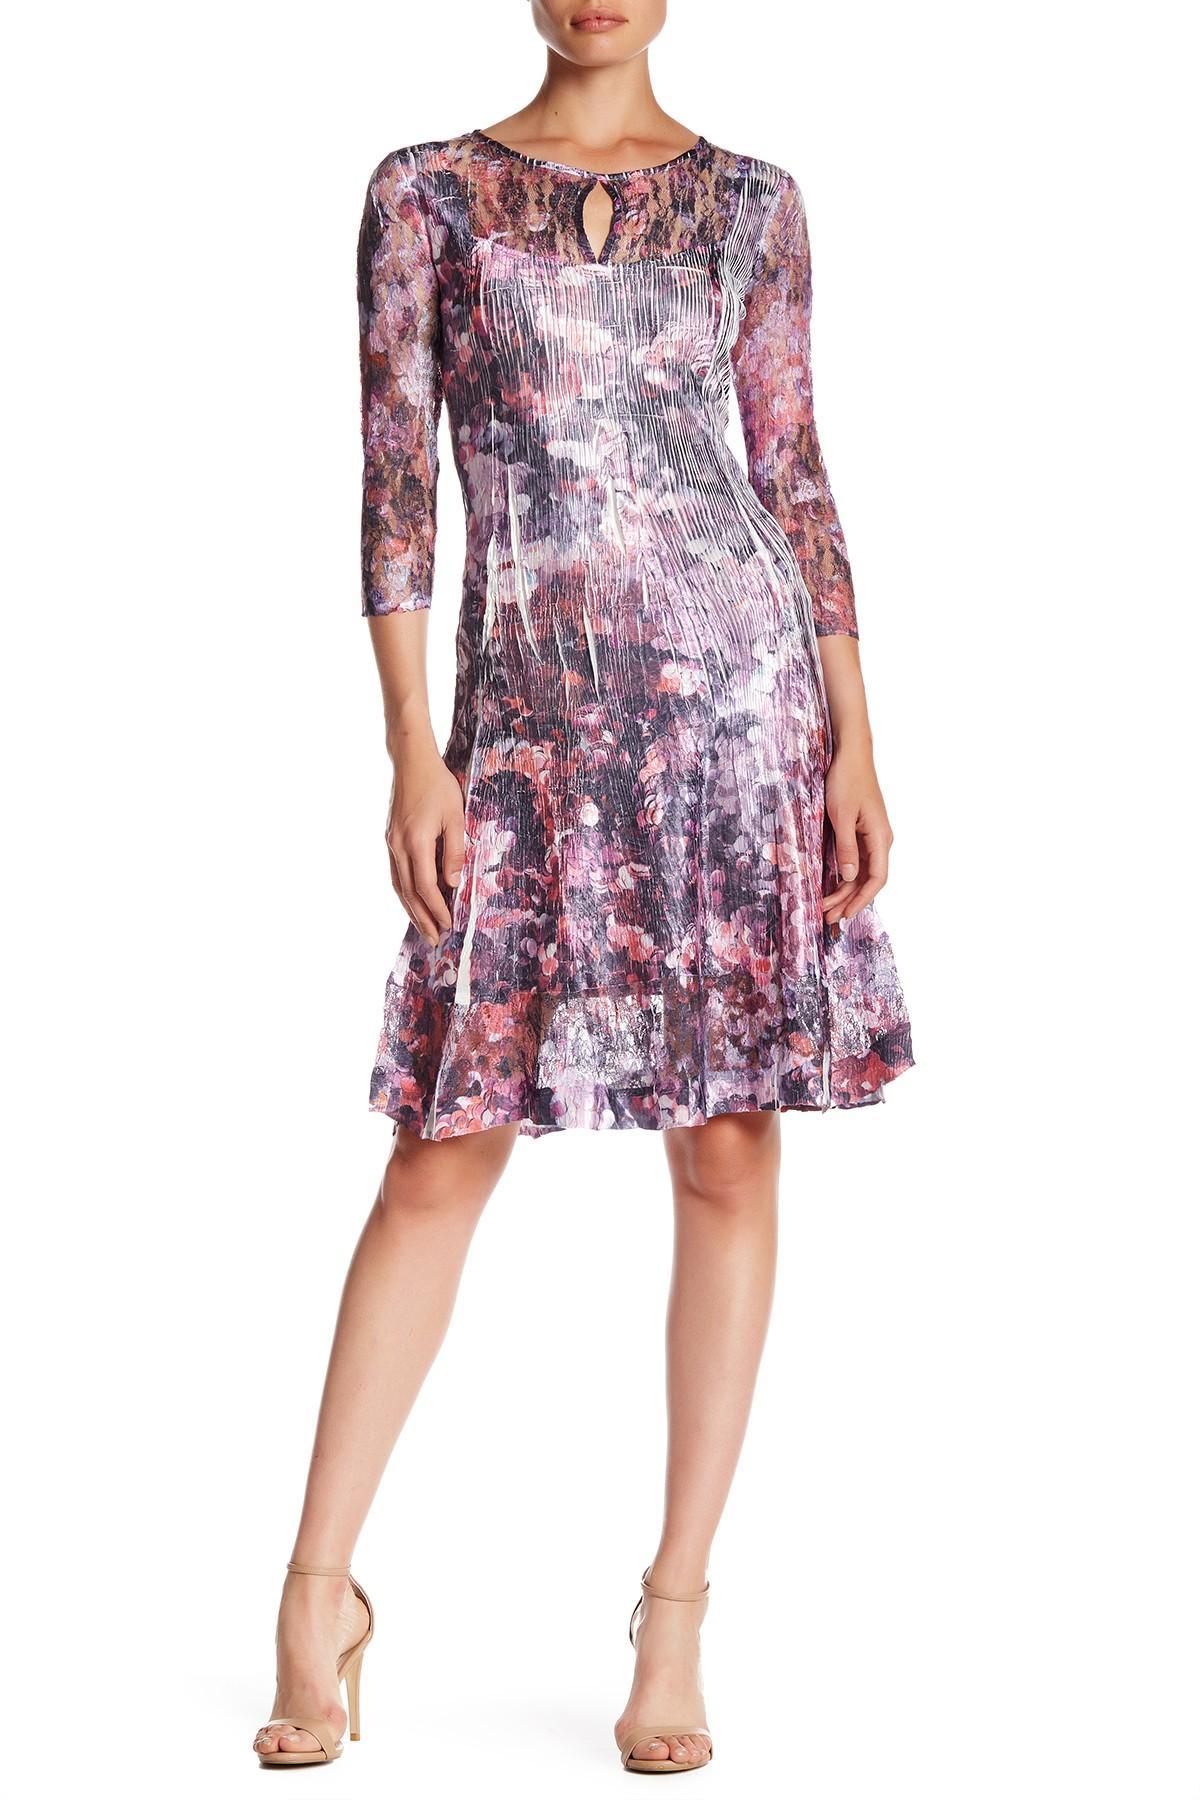 Komarov fit flare printed dress lyst for Nordstrom rack dresses pour mariage